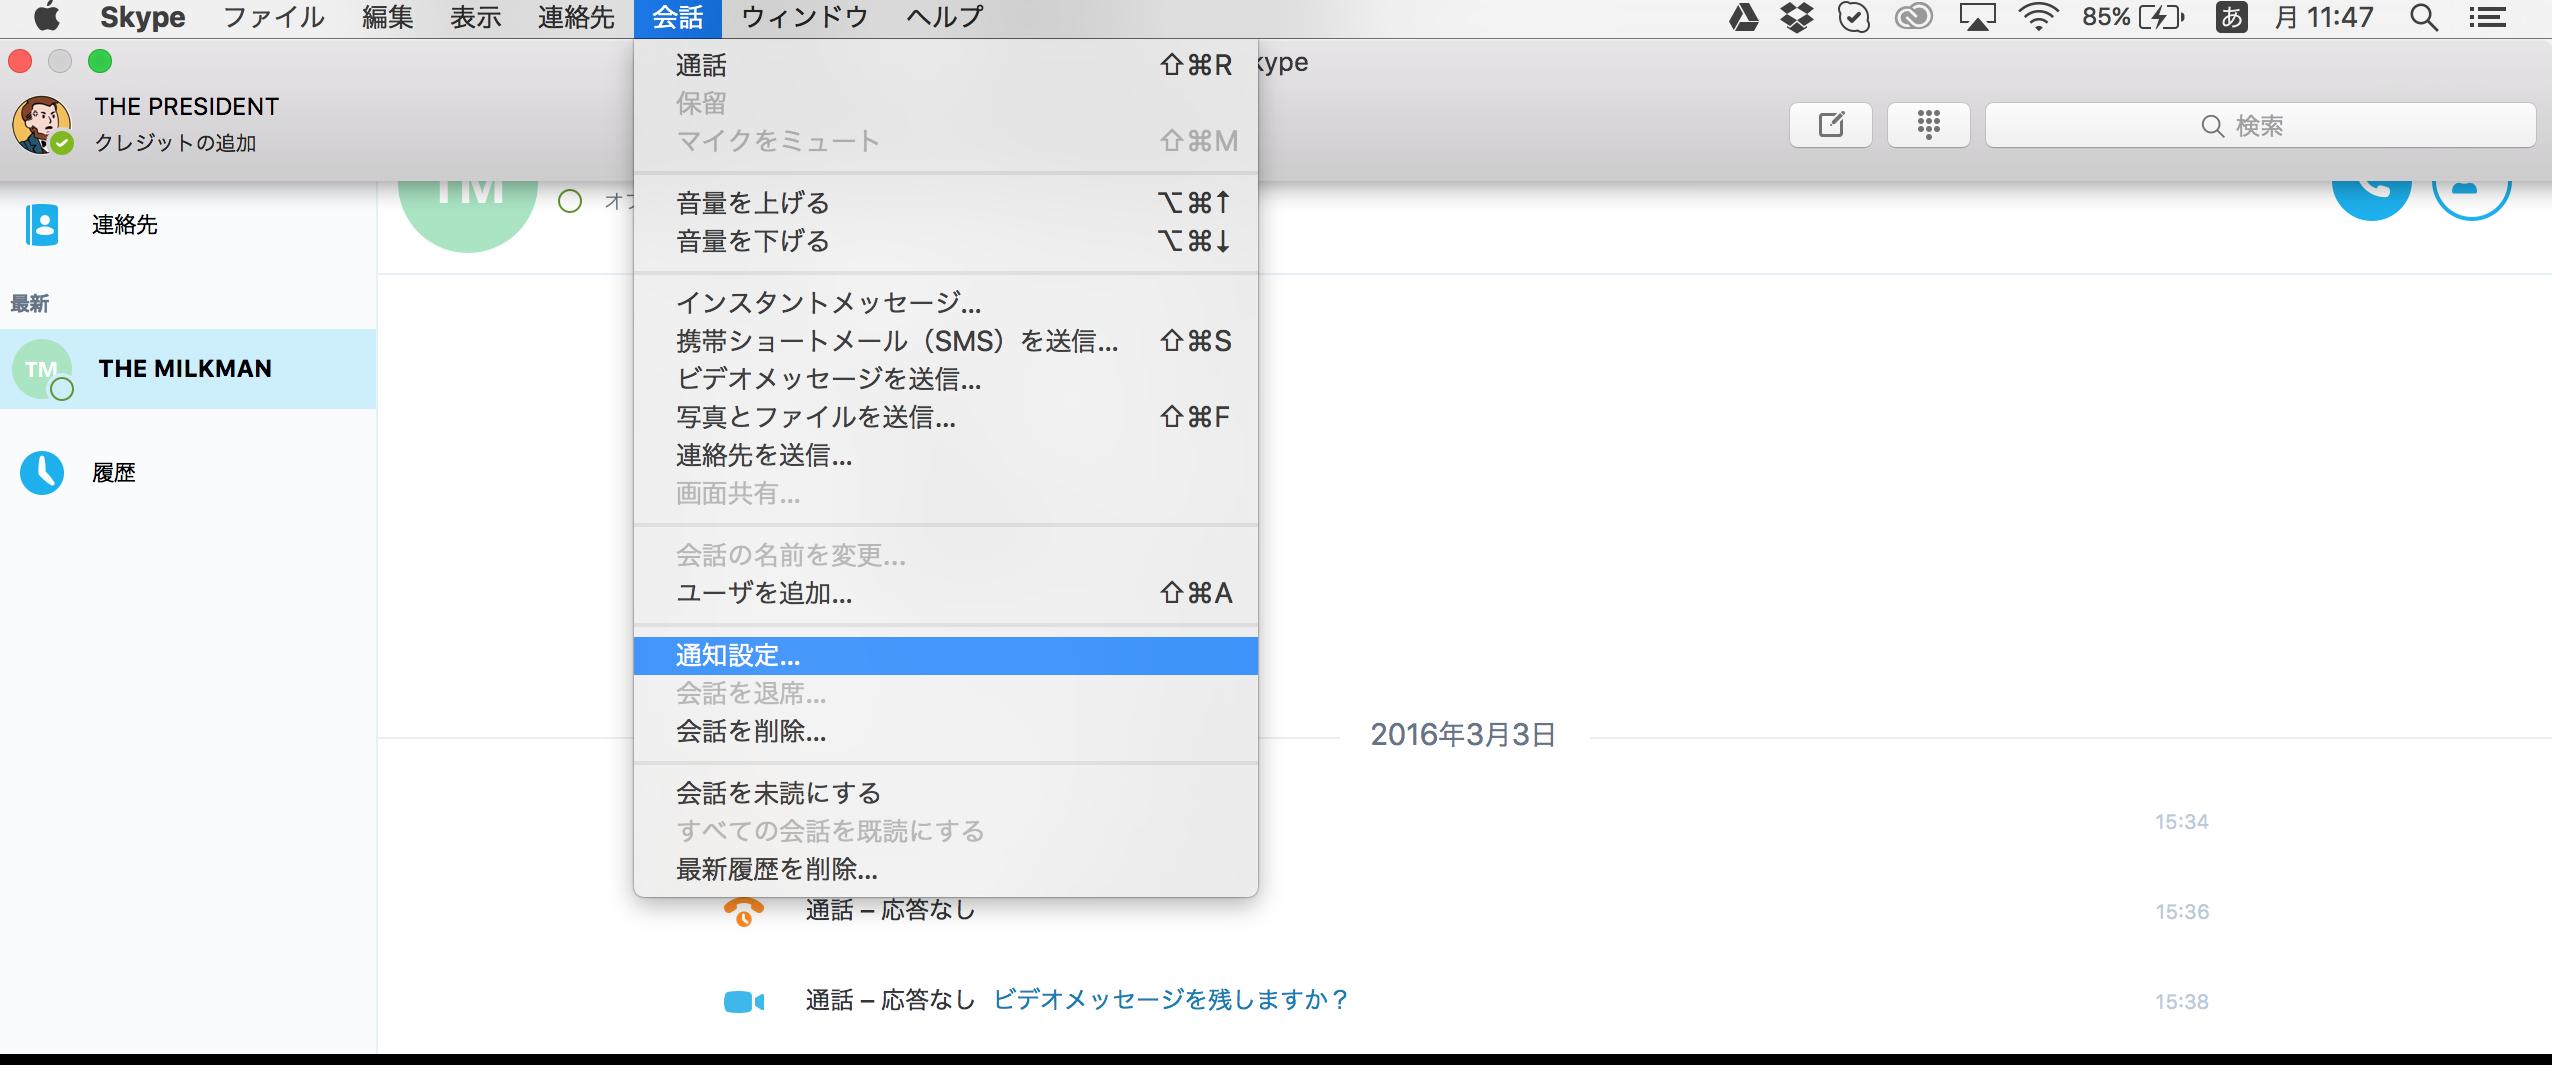 skype06